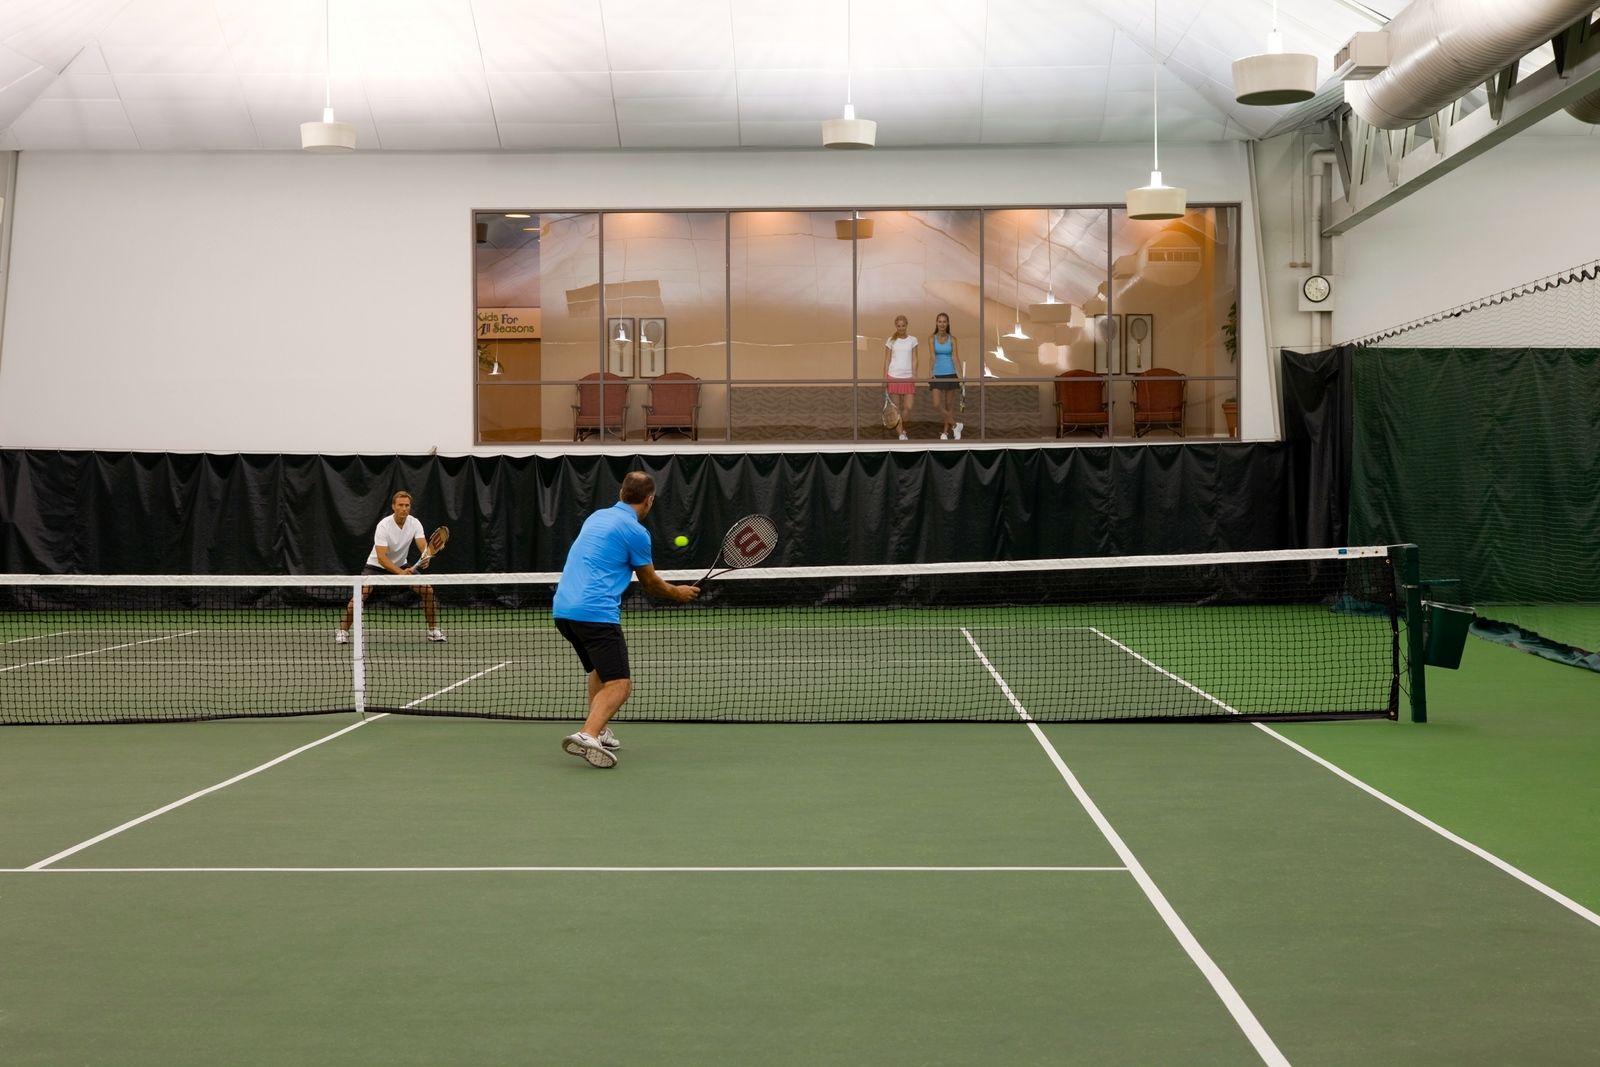 tennis-tourist-courtesy-dallas-four-seasons-tennis-courts-indoor